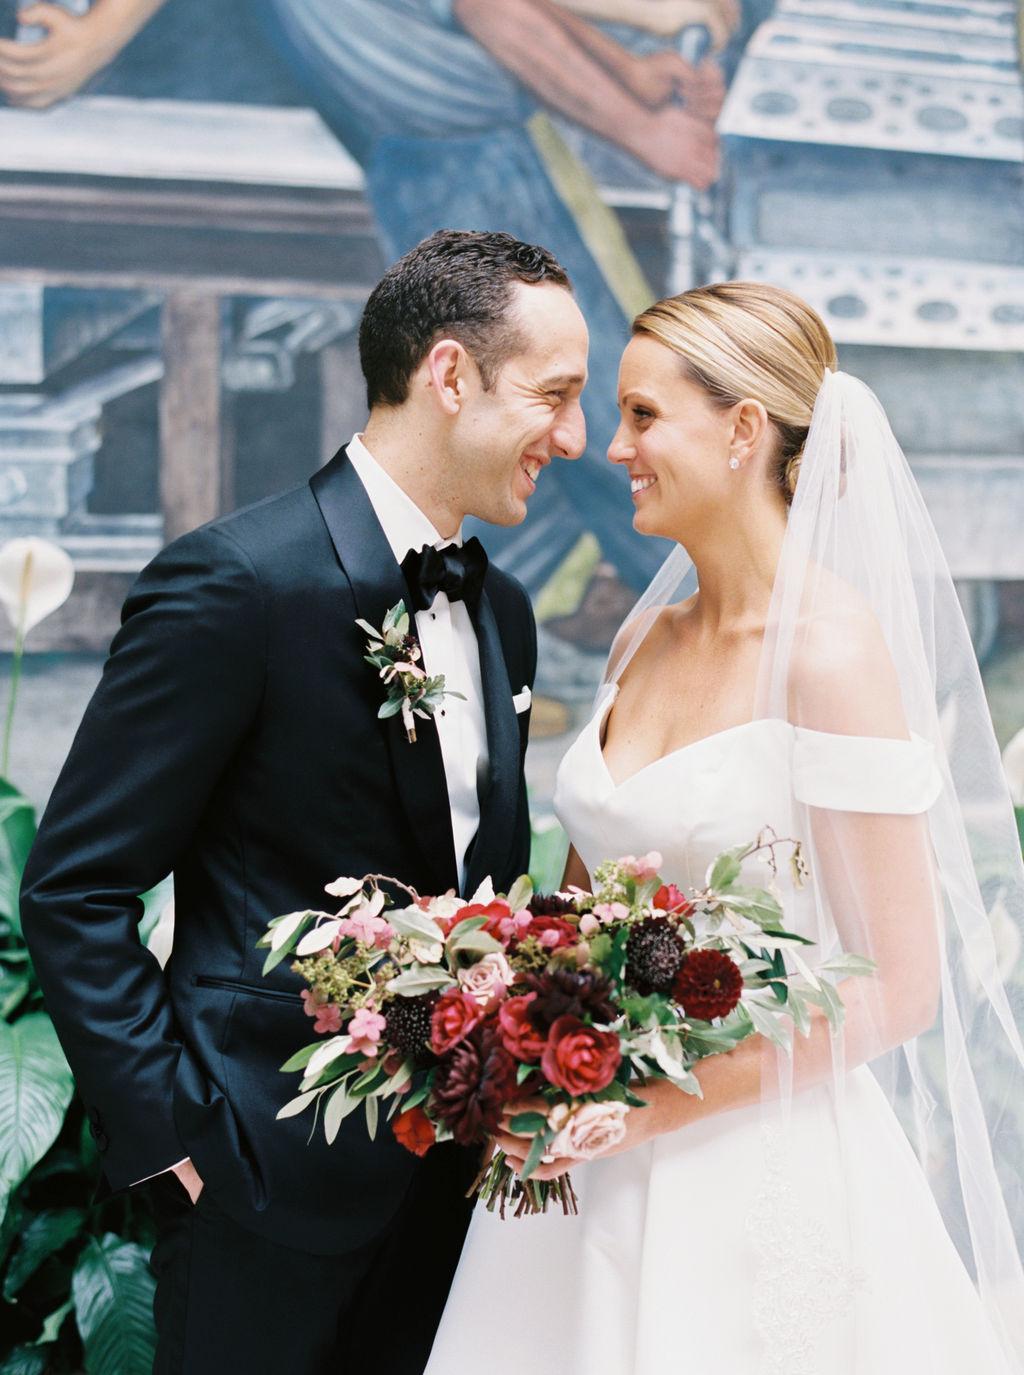 Kyle-Menna-Wedding-krmorenophoto-388.jpg